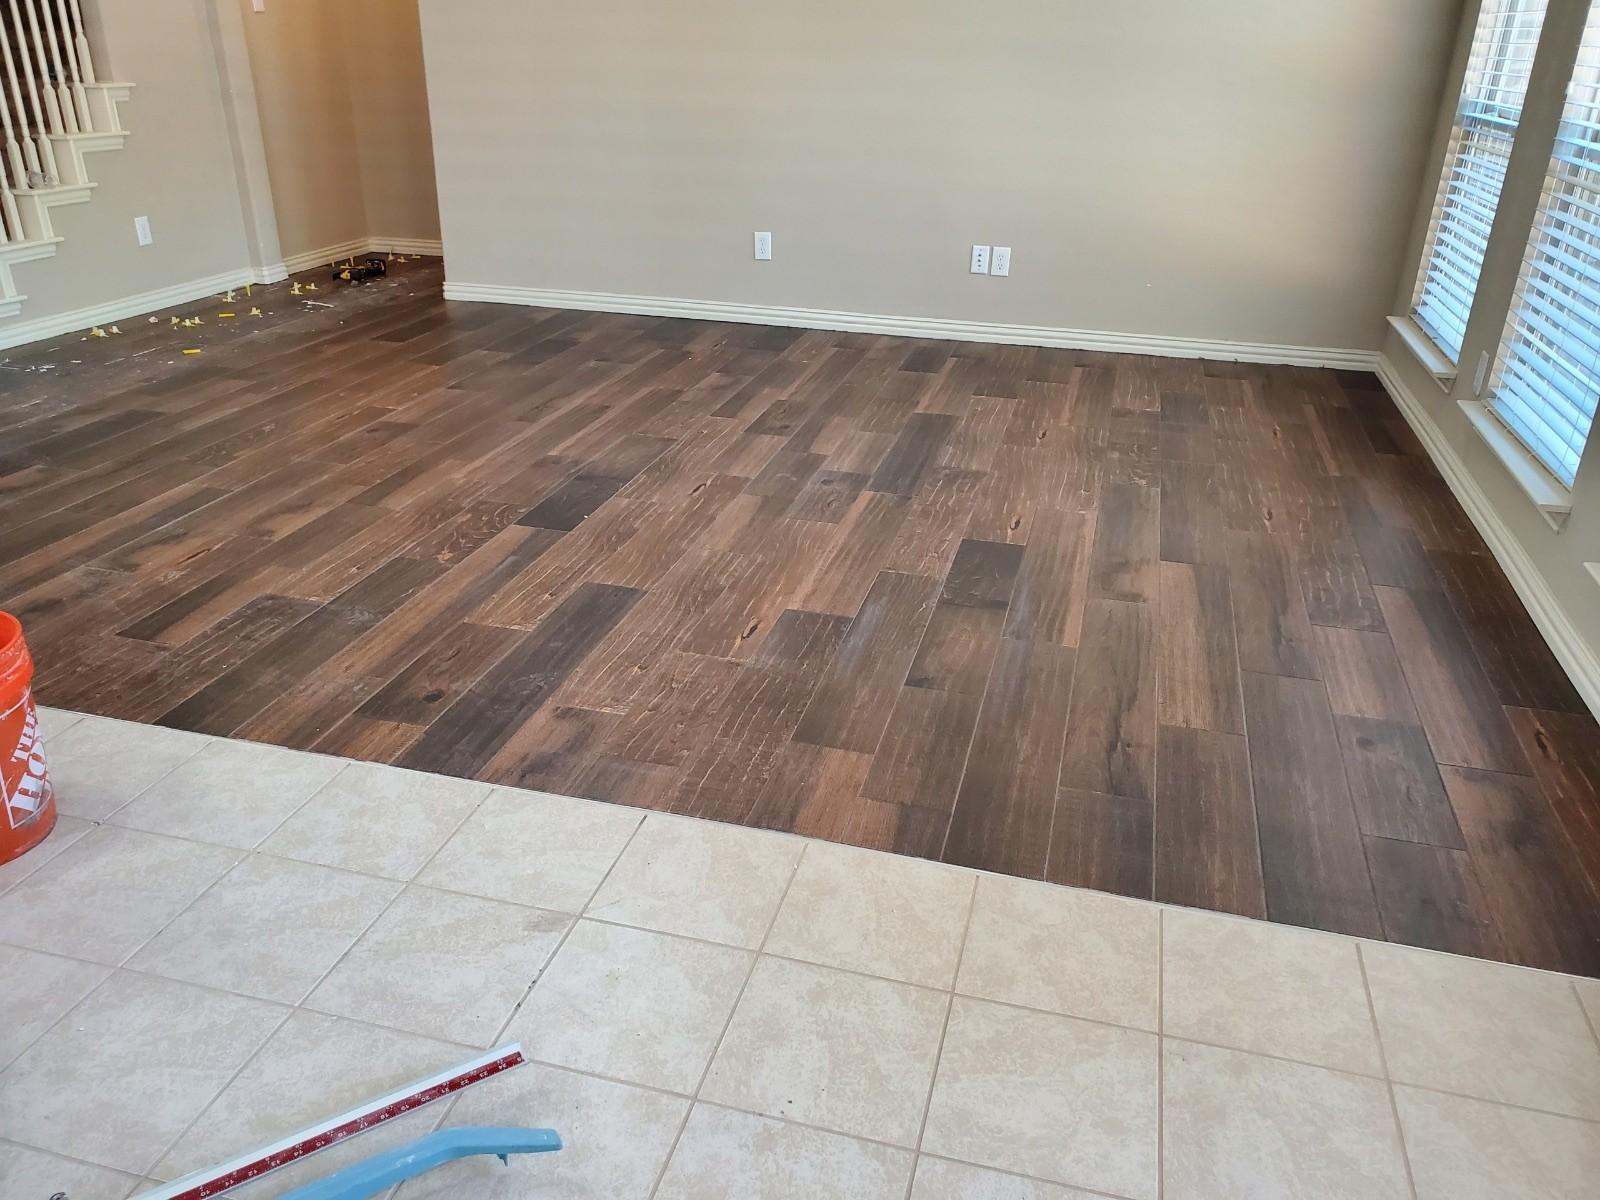 Wood Tile || Corinth, Texas